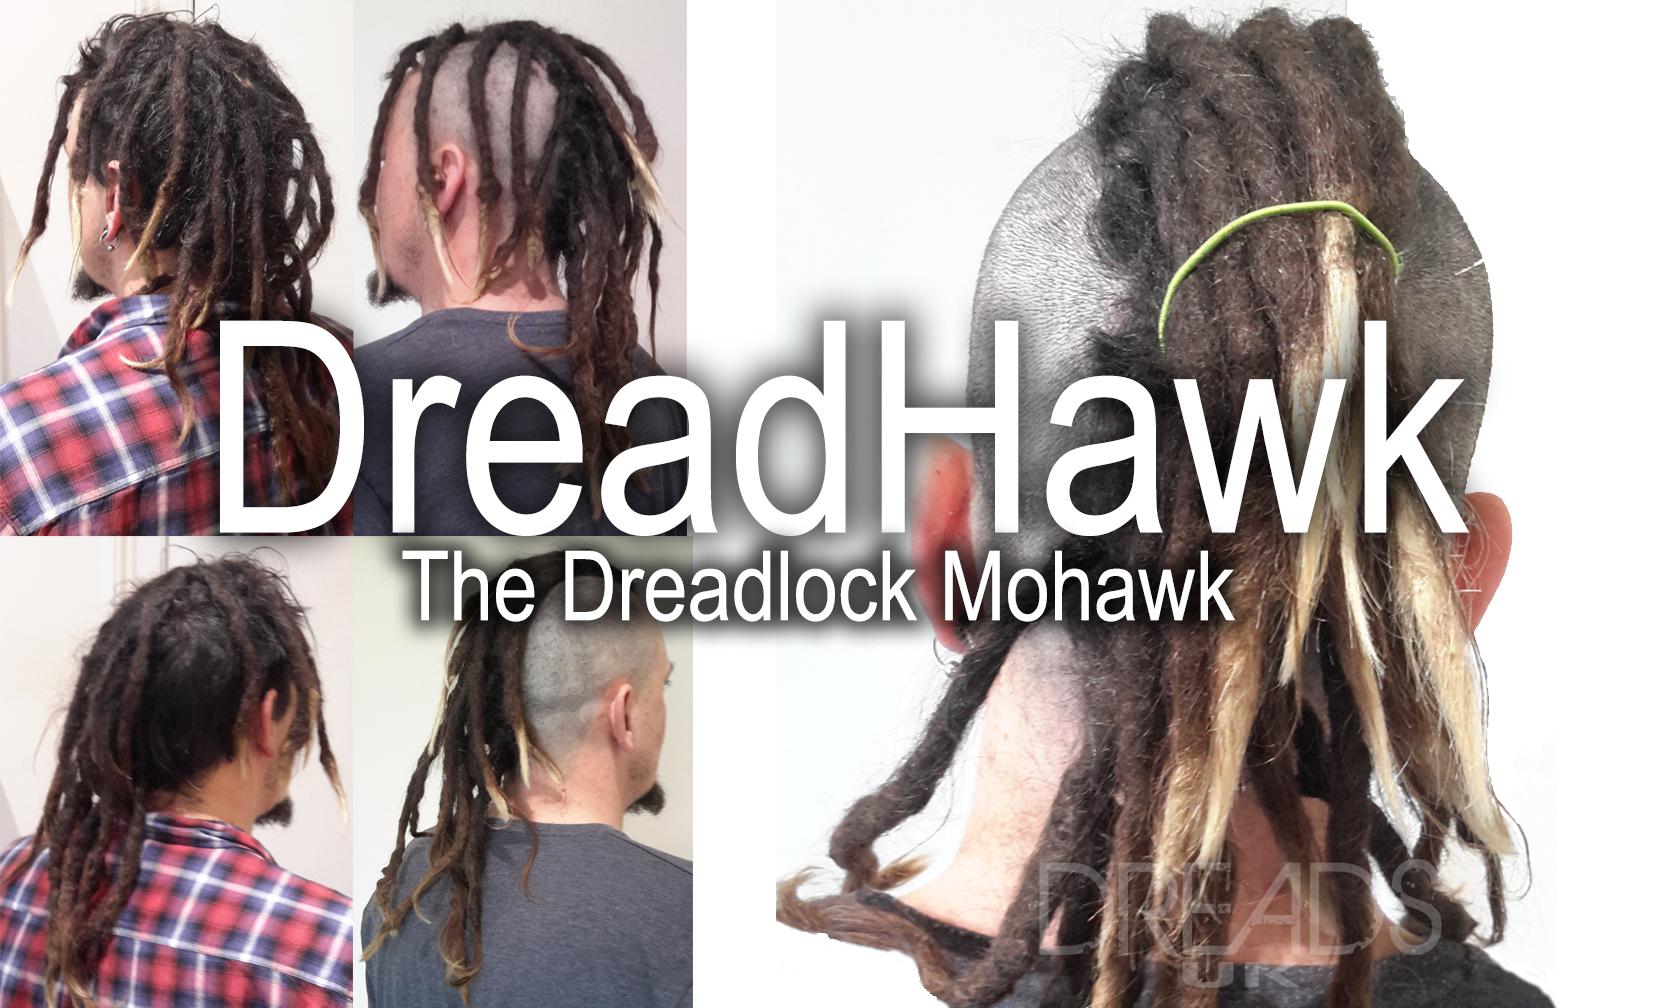 Wondrous Dreadhawk The Dreadlocks Mohawk Dreads Uk Dreadlocks Guide Hairstyle Inspiration Daily Dogsangcom